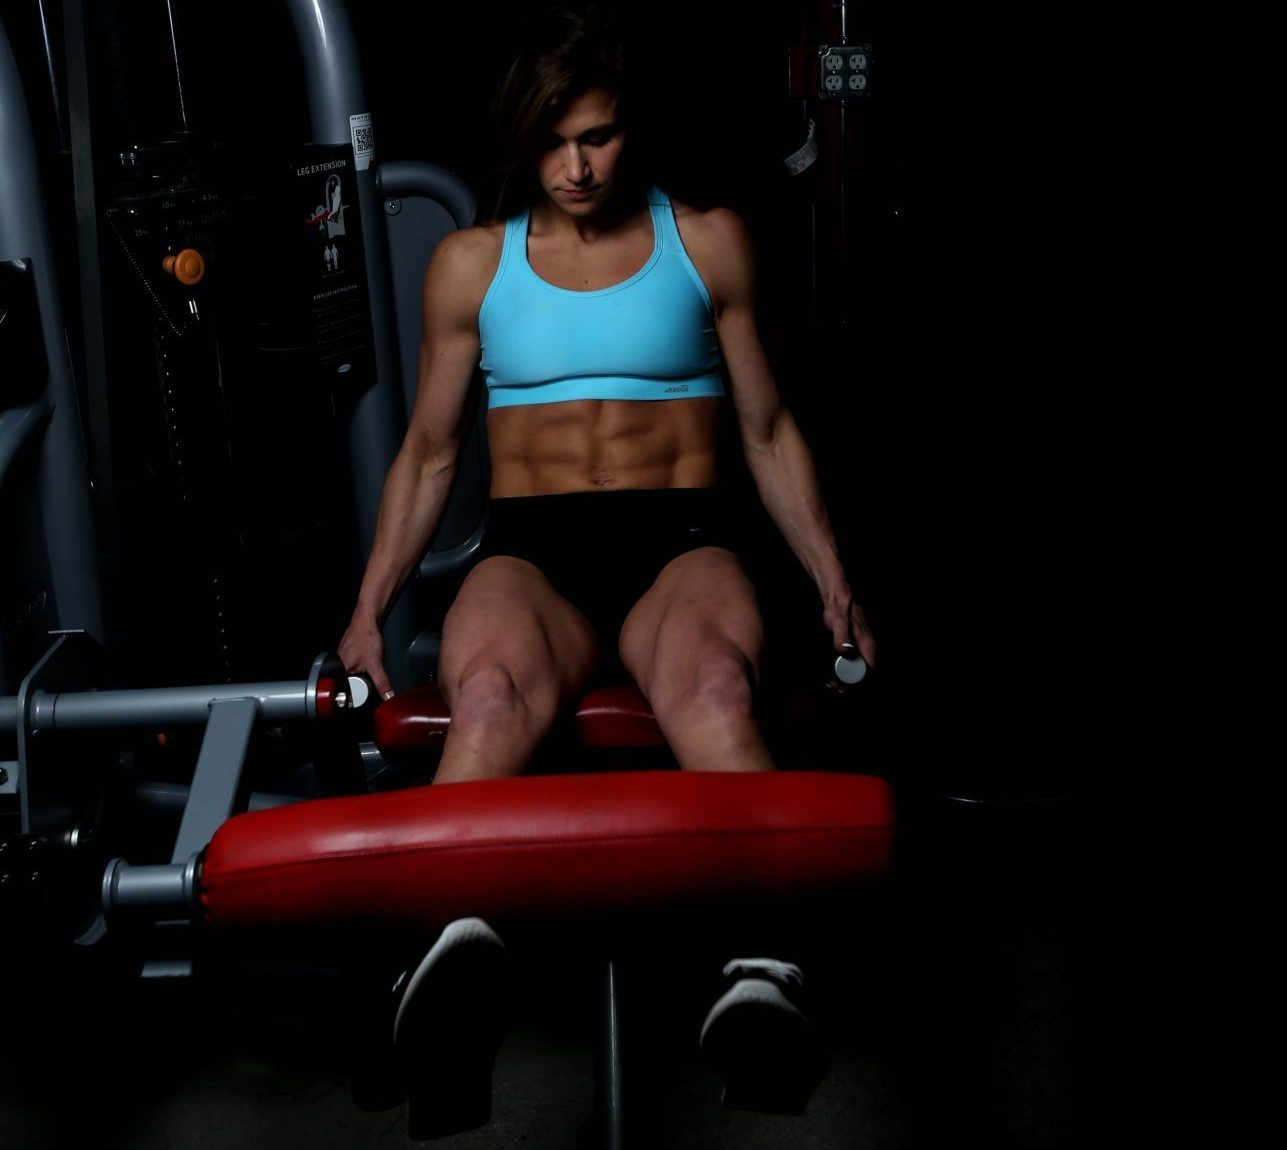 meagan_workout_motivation-leg-extension